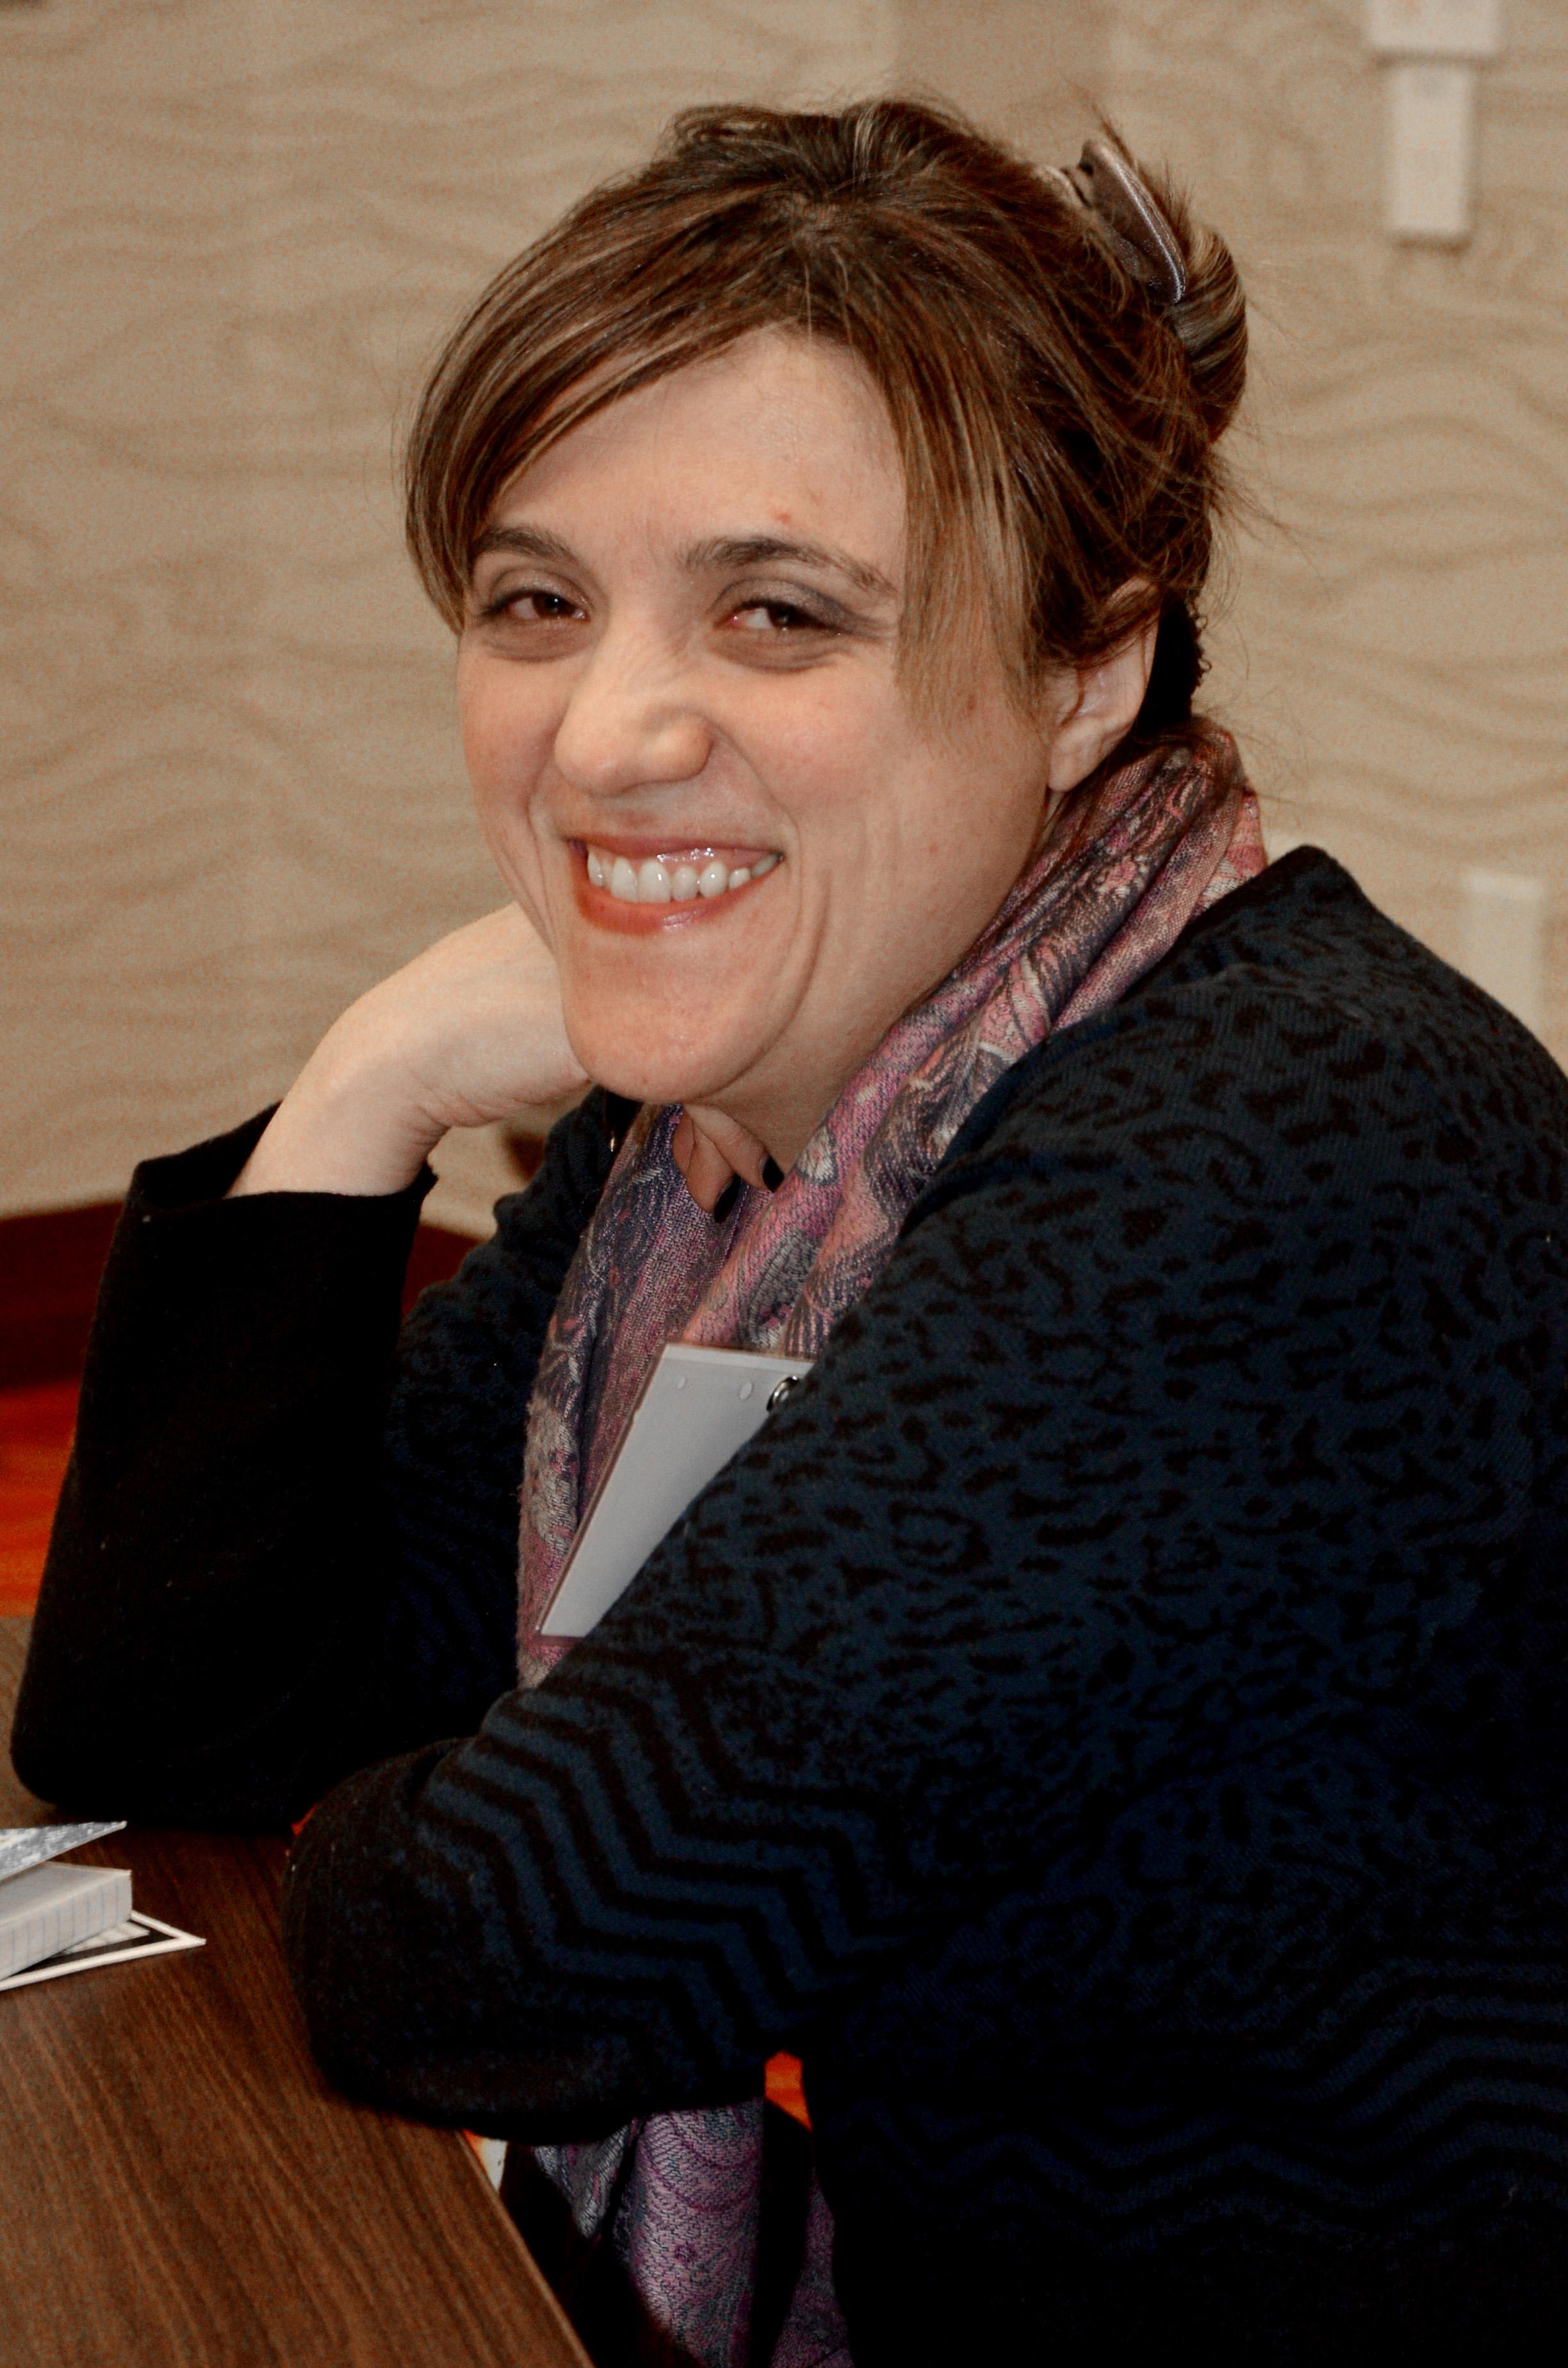 019-Elina-Golod-JPG.jpg